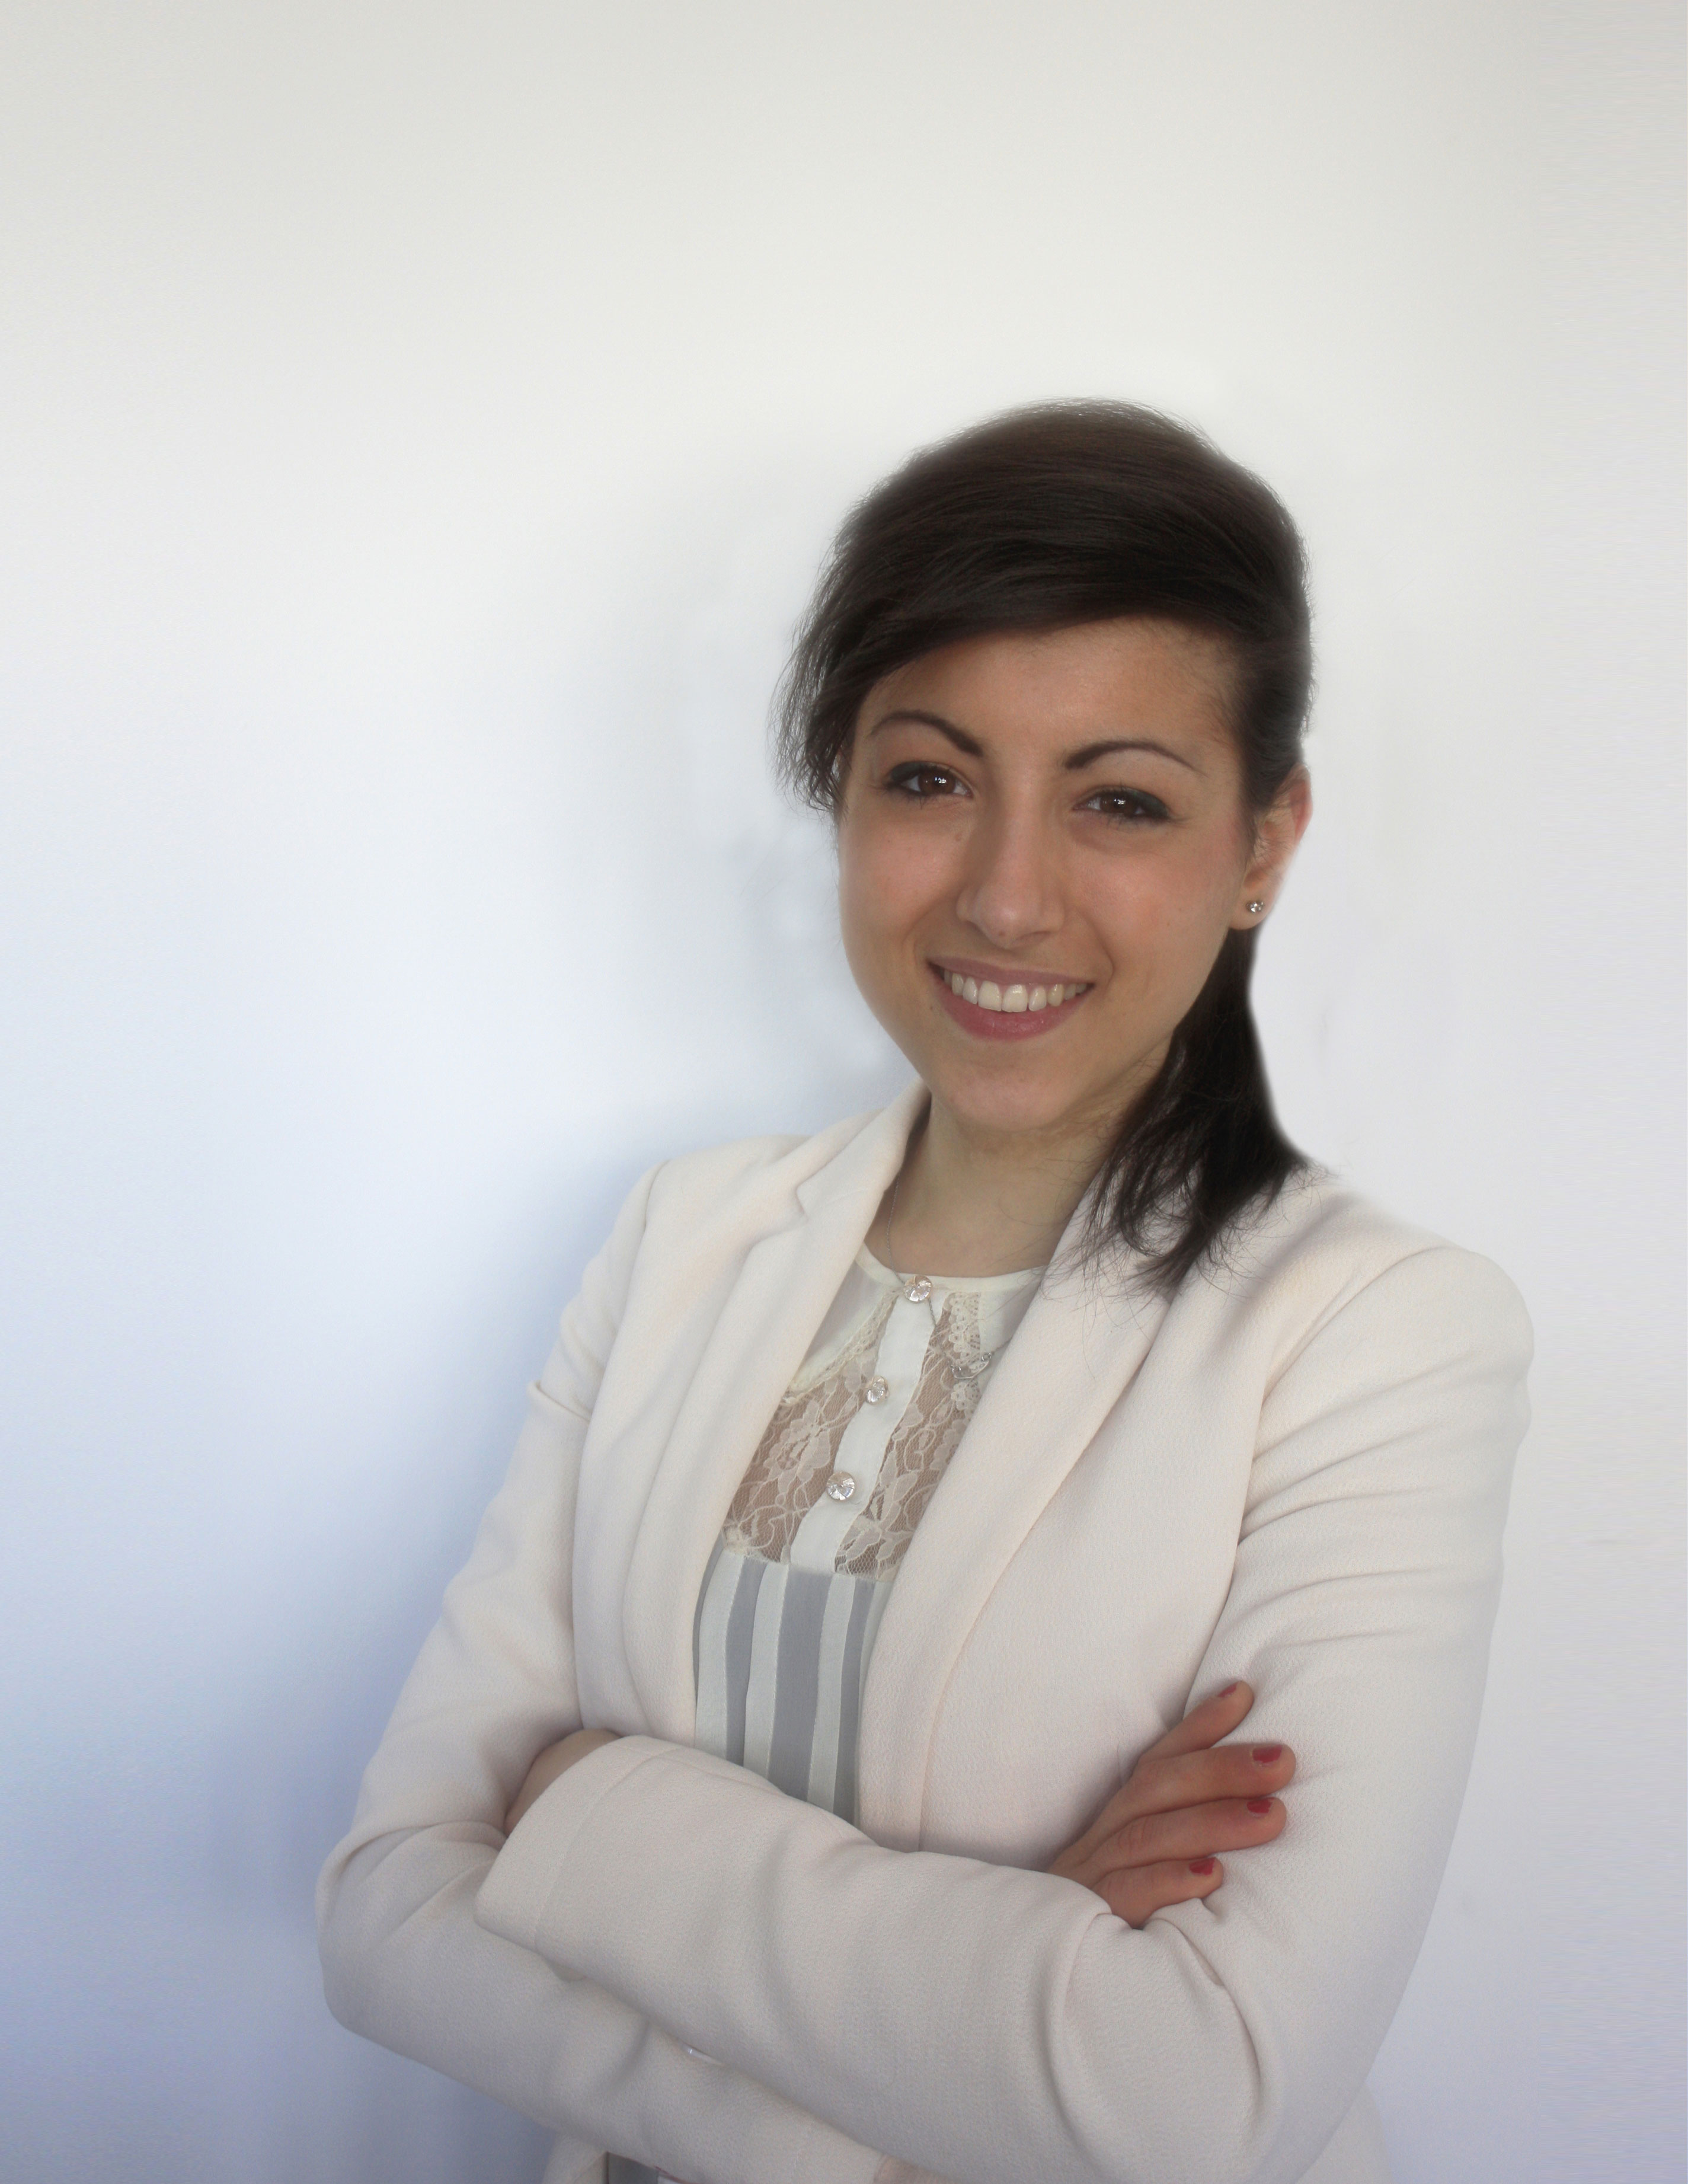 Alexia Gatta